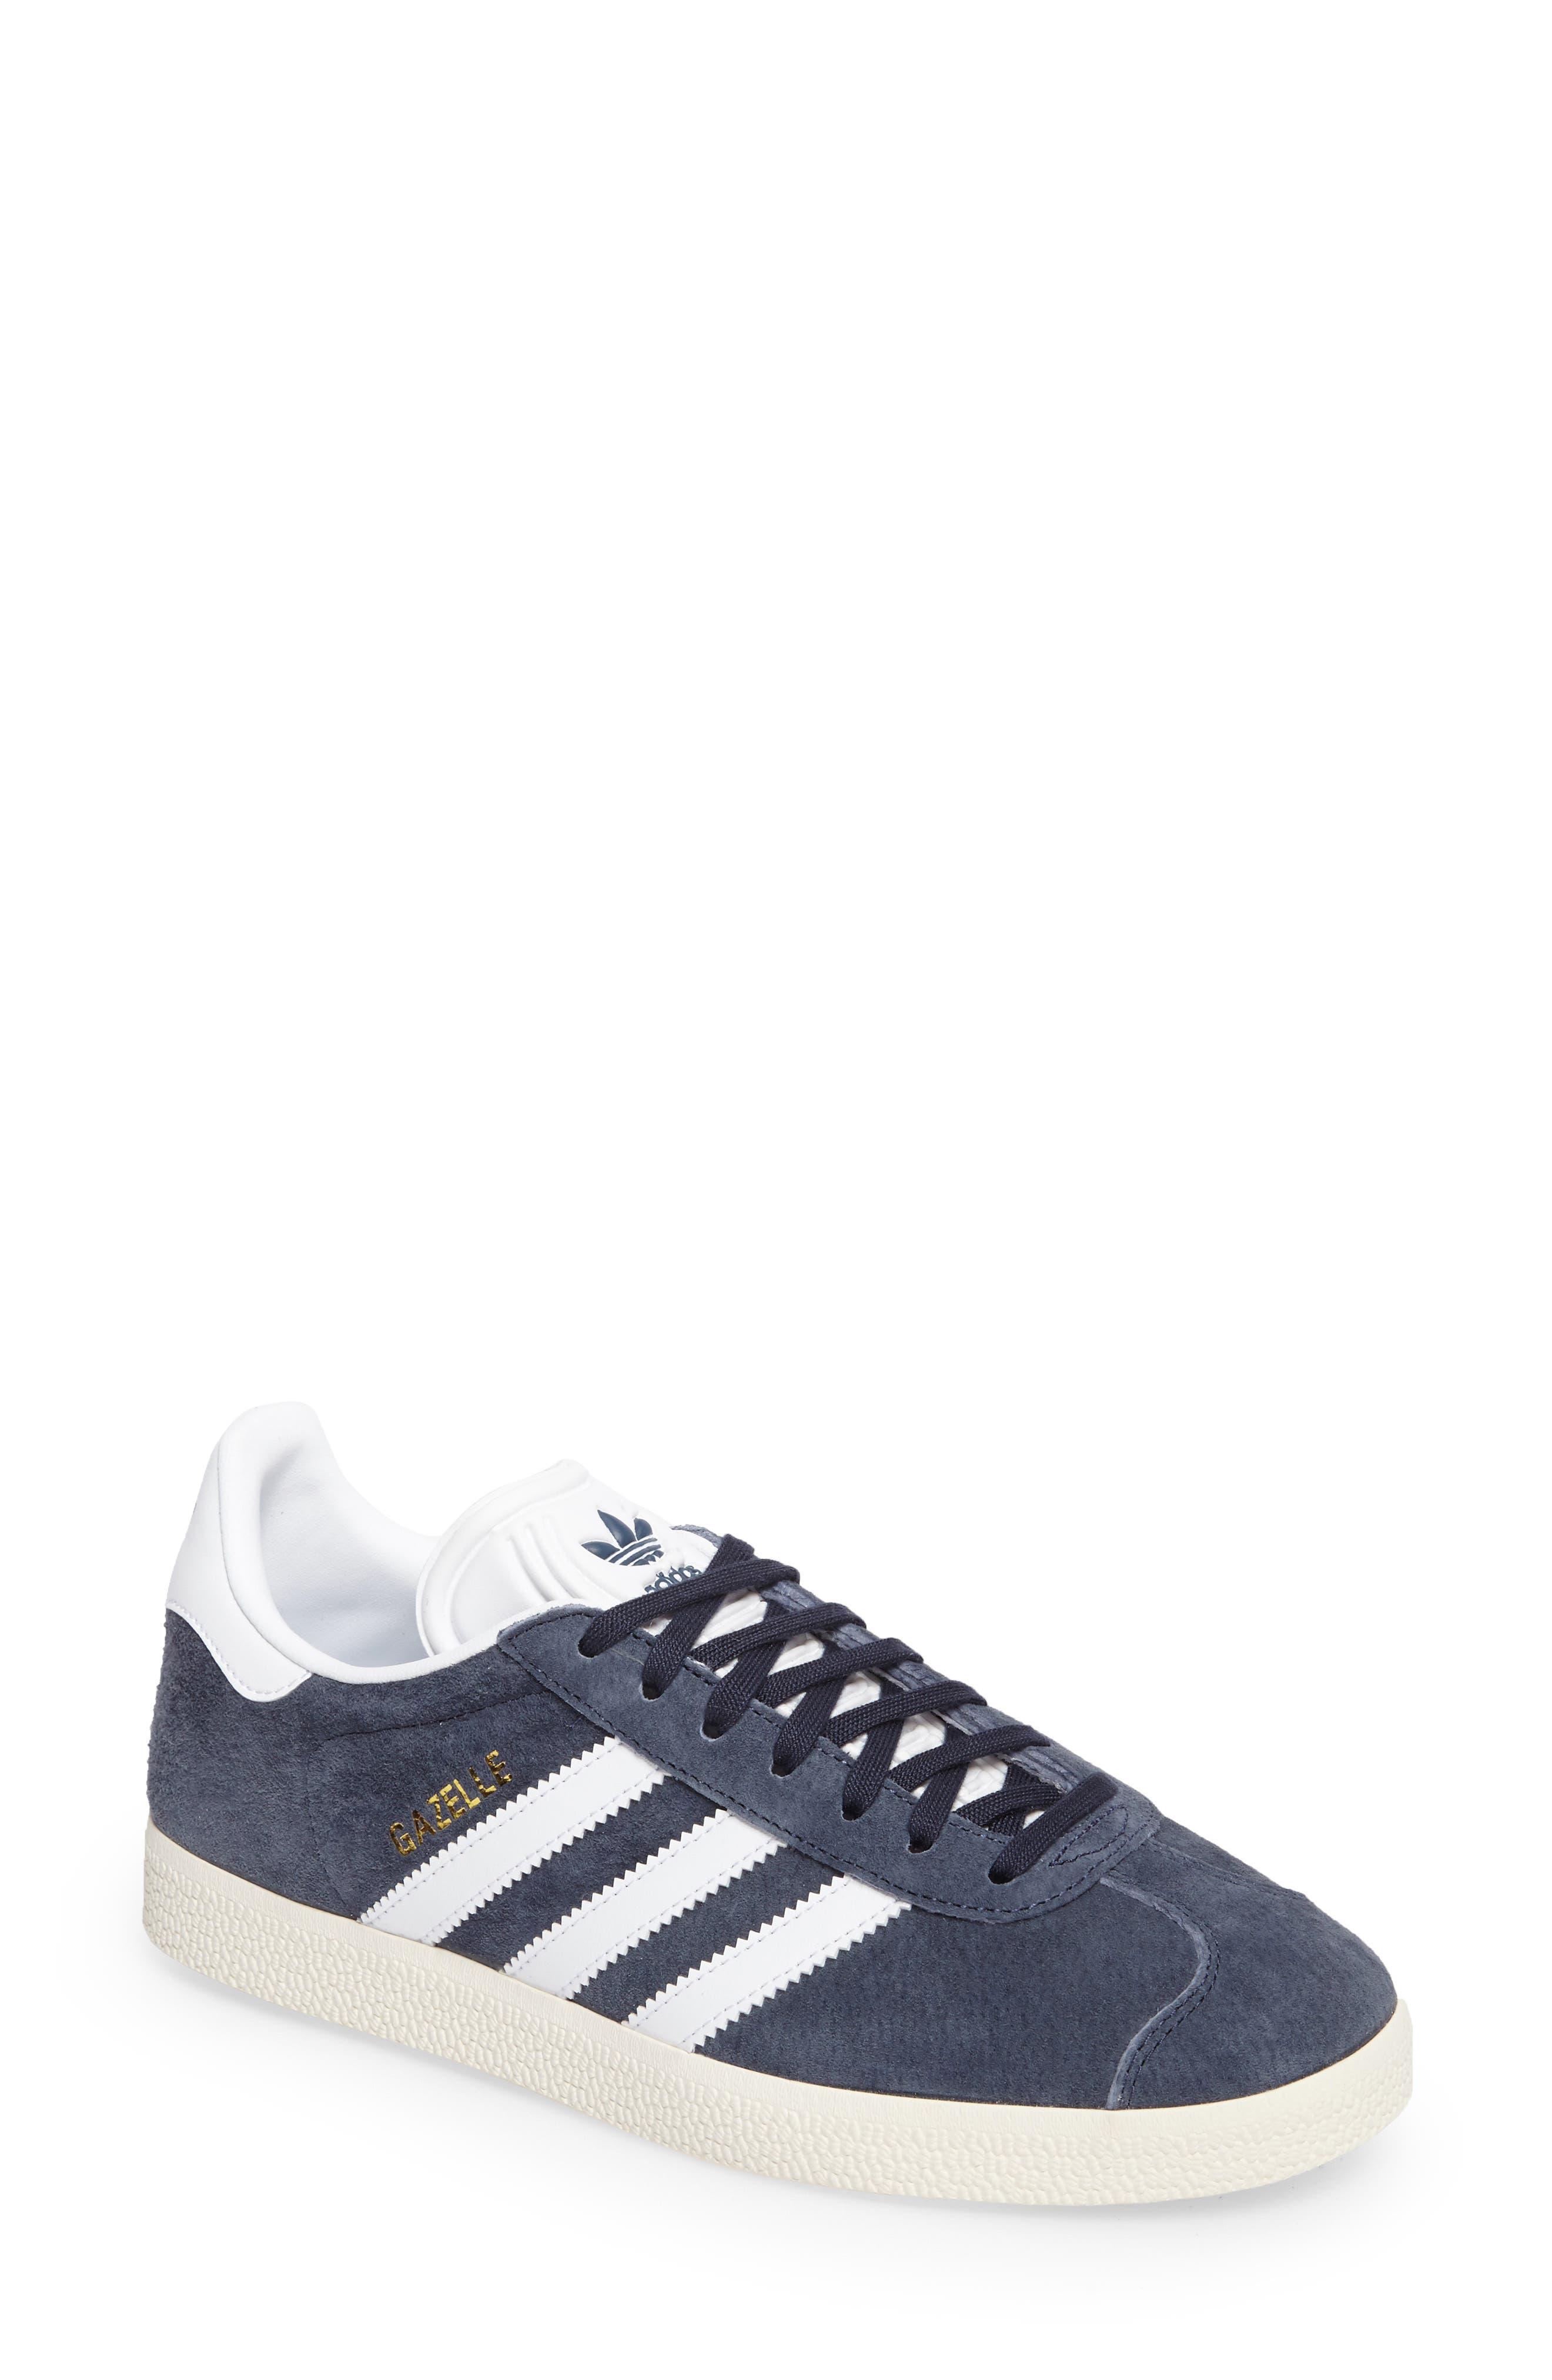 Main Image - adidas Gazelle Sneaker